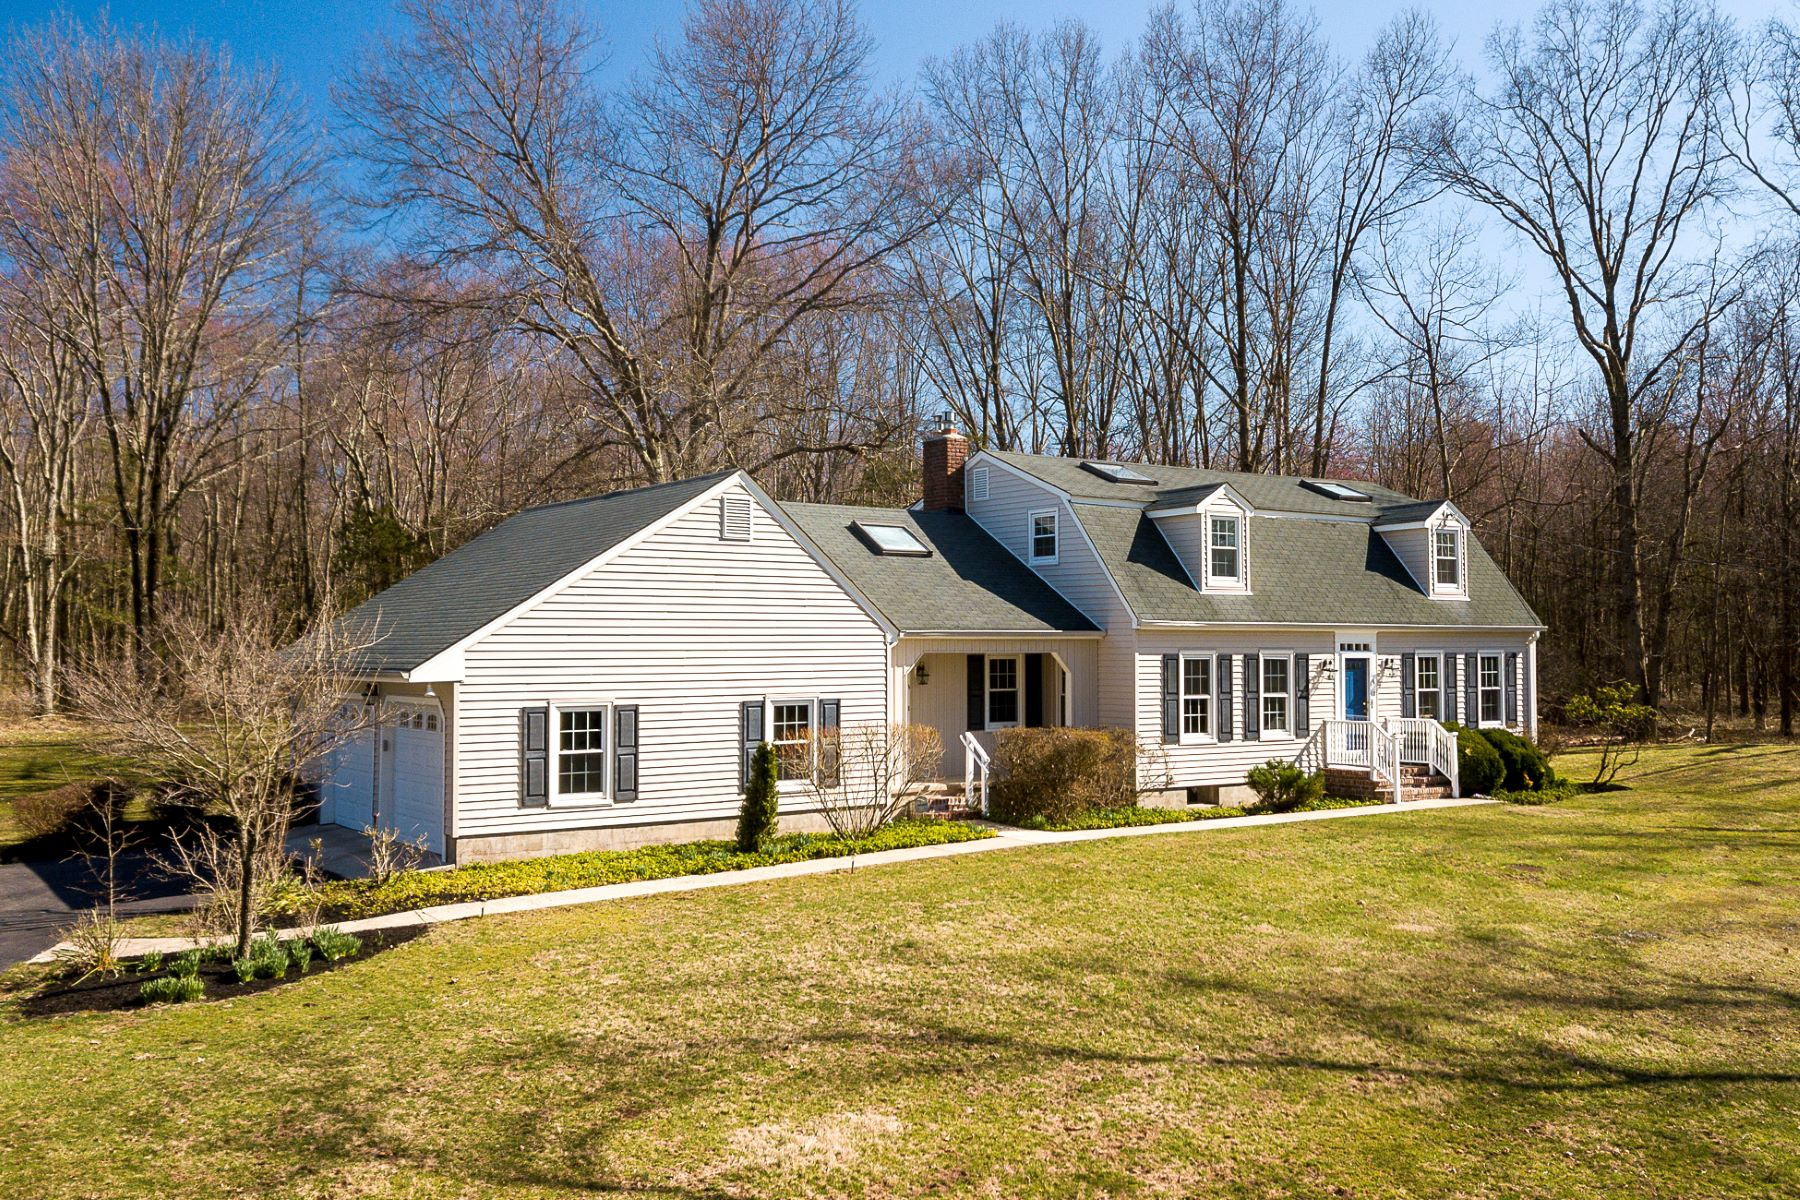 Property για την Πώληση στο Lovely Home, Lovely Setting 13 Cleveland Road West, Princeton, Νιου Τζερσεϋ 08540 Ηνωμένες Πολιτείες